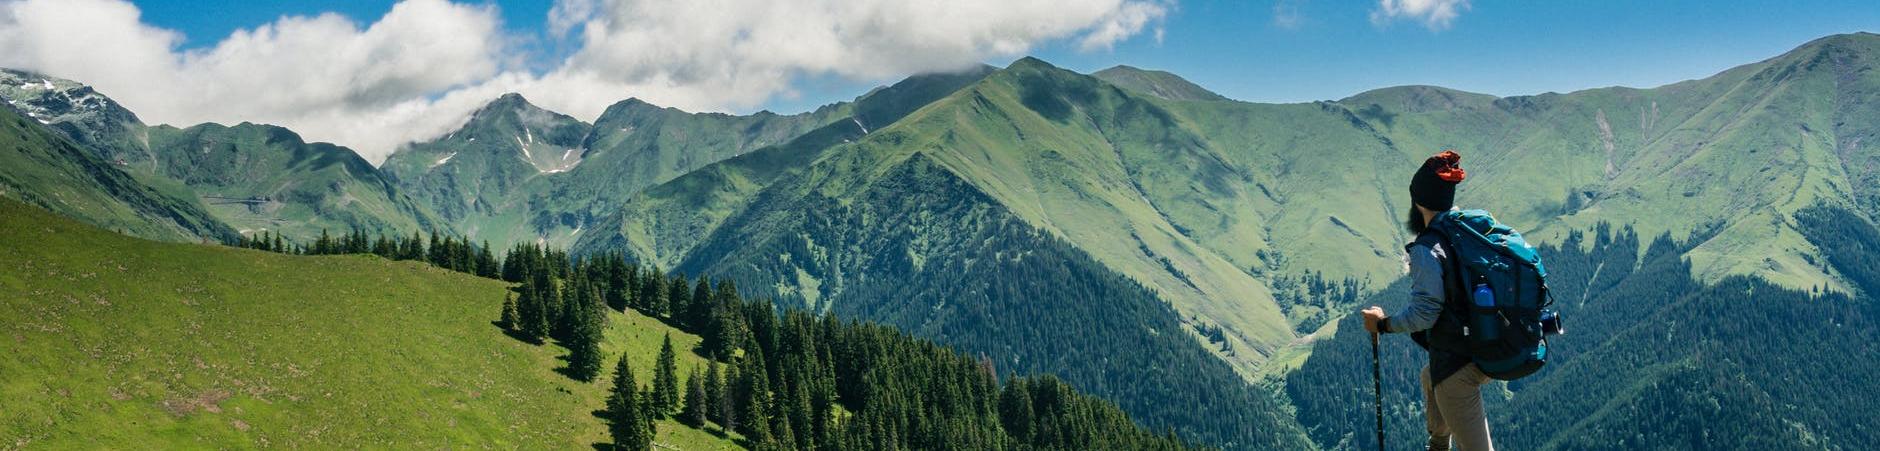 планина, блог